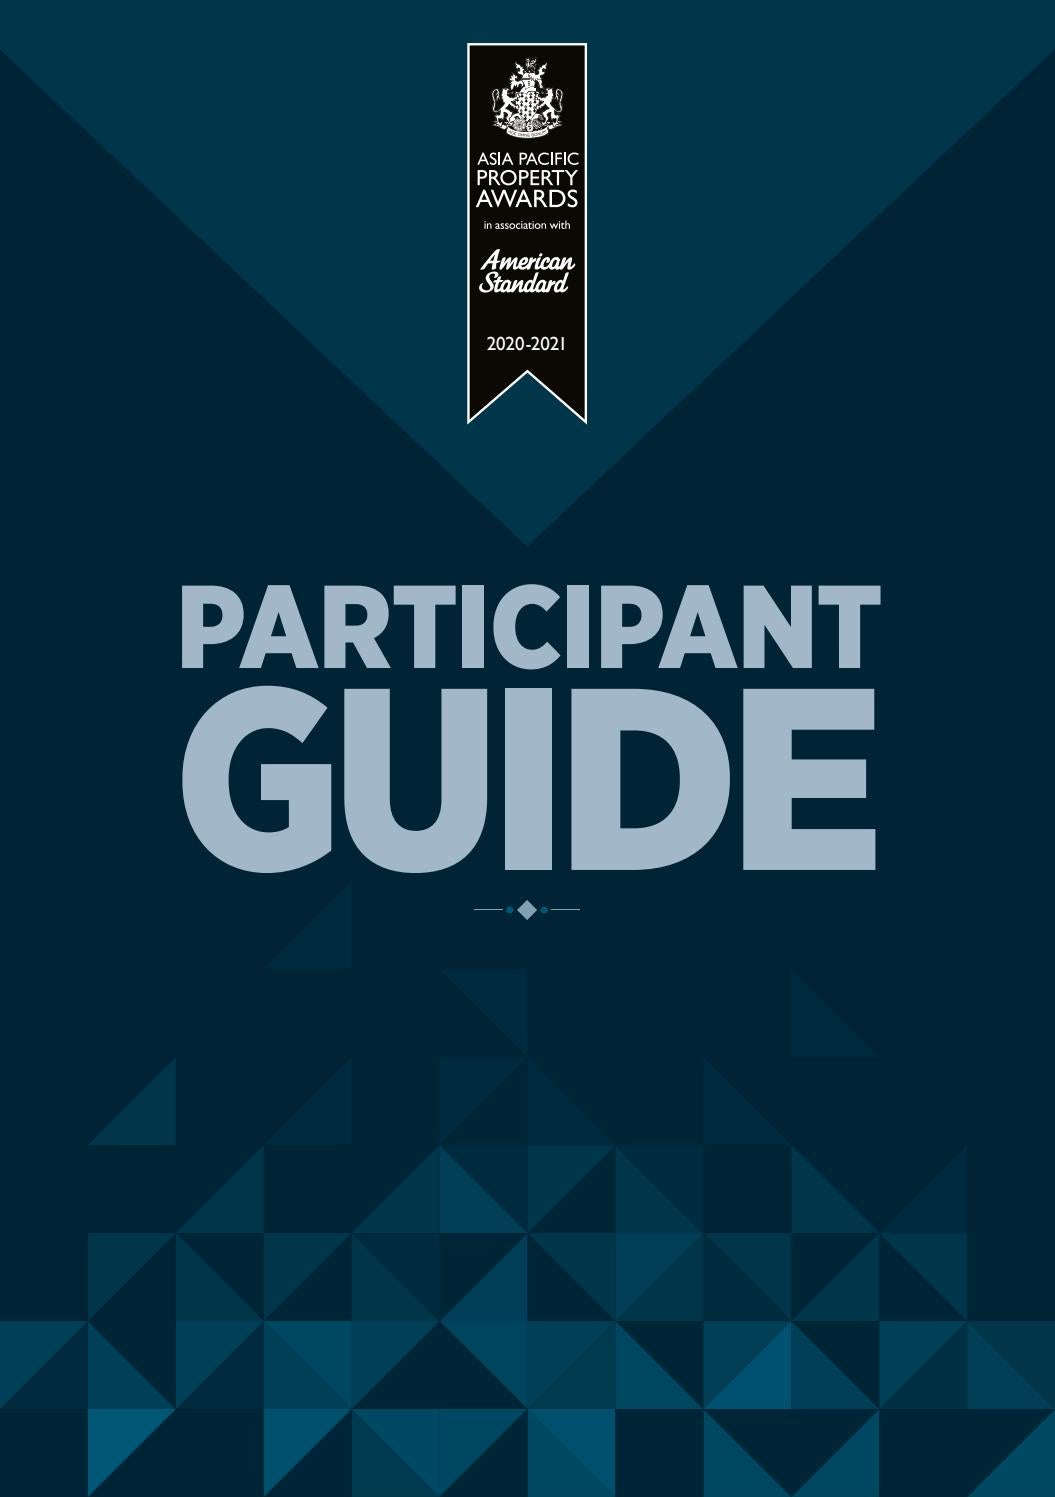 Master Jitu Biz : master, Pacific, Awards, 2020-2021, Participant, Guide, International, Property, Media, Issuu